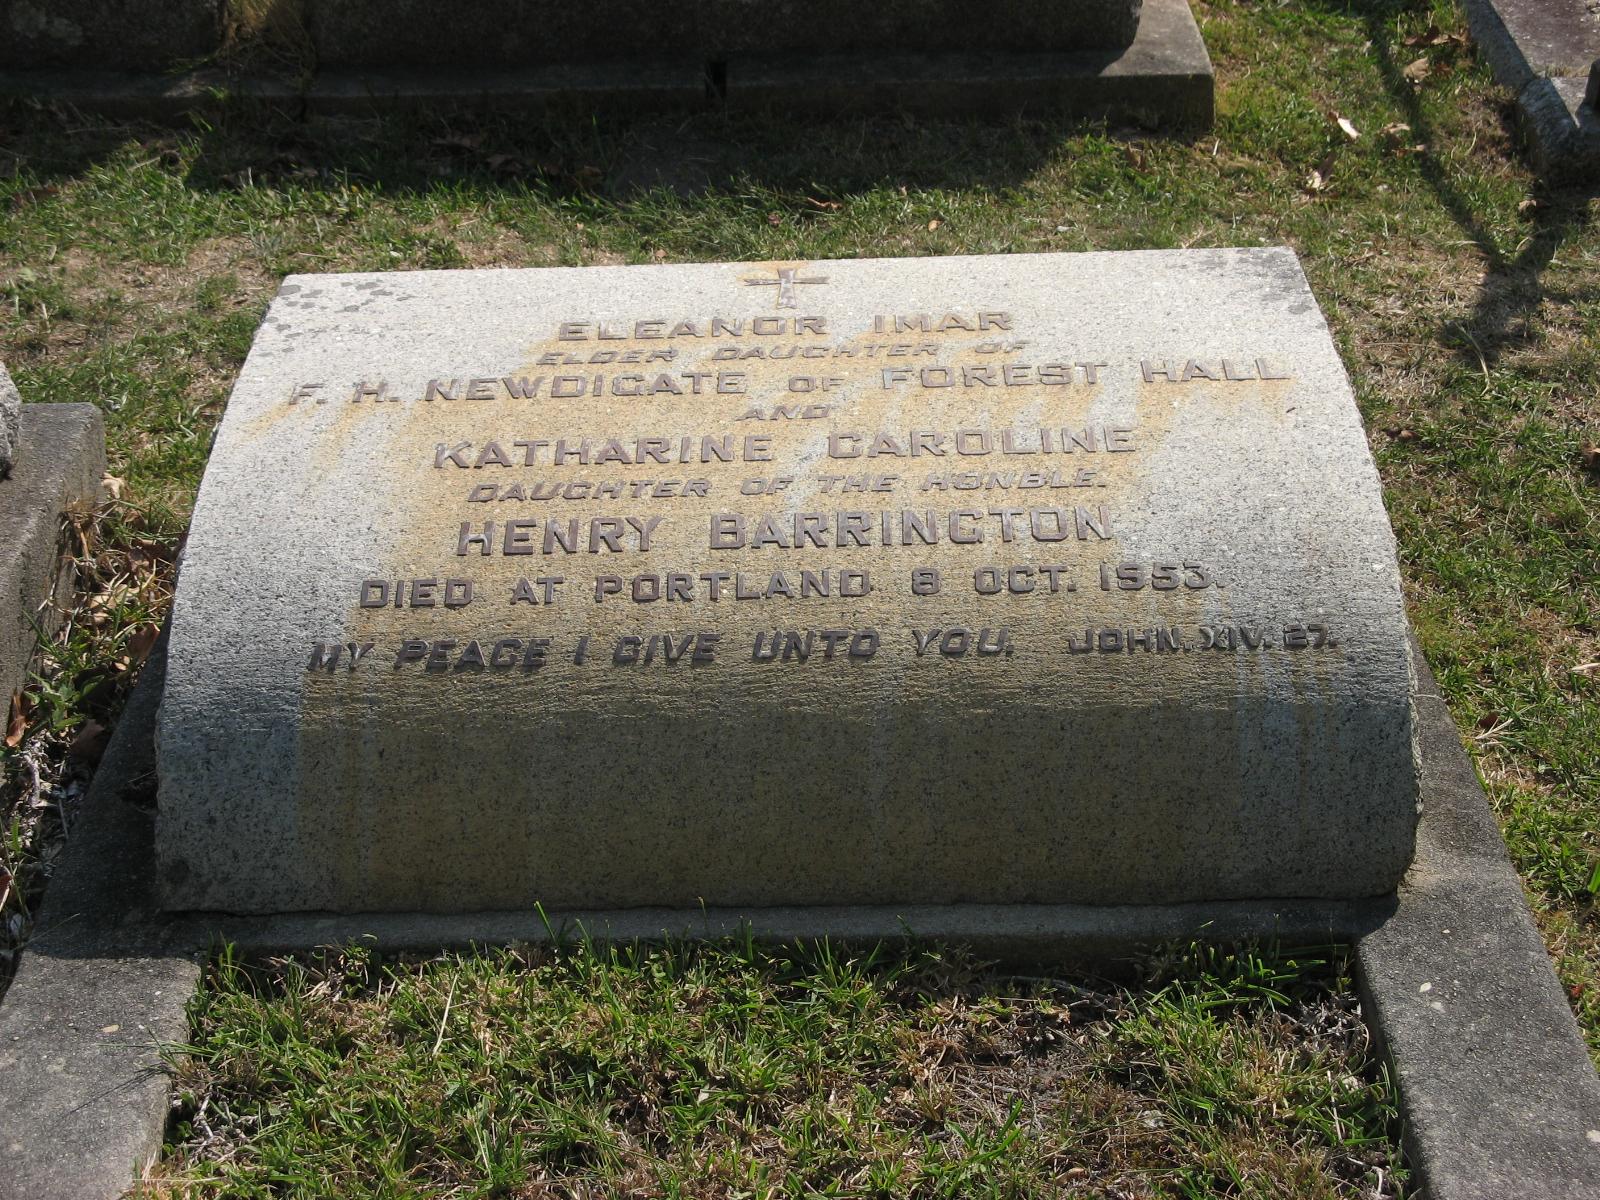 Newdigate, Eleanor Imar + Barrington, Katherine Caroline